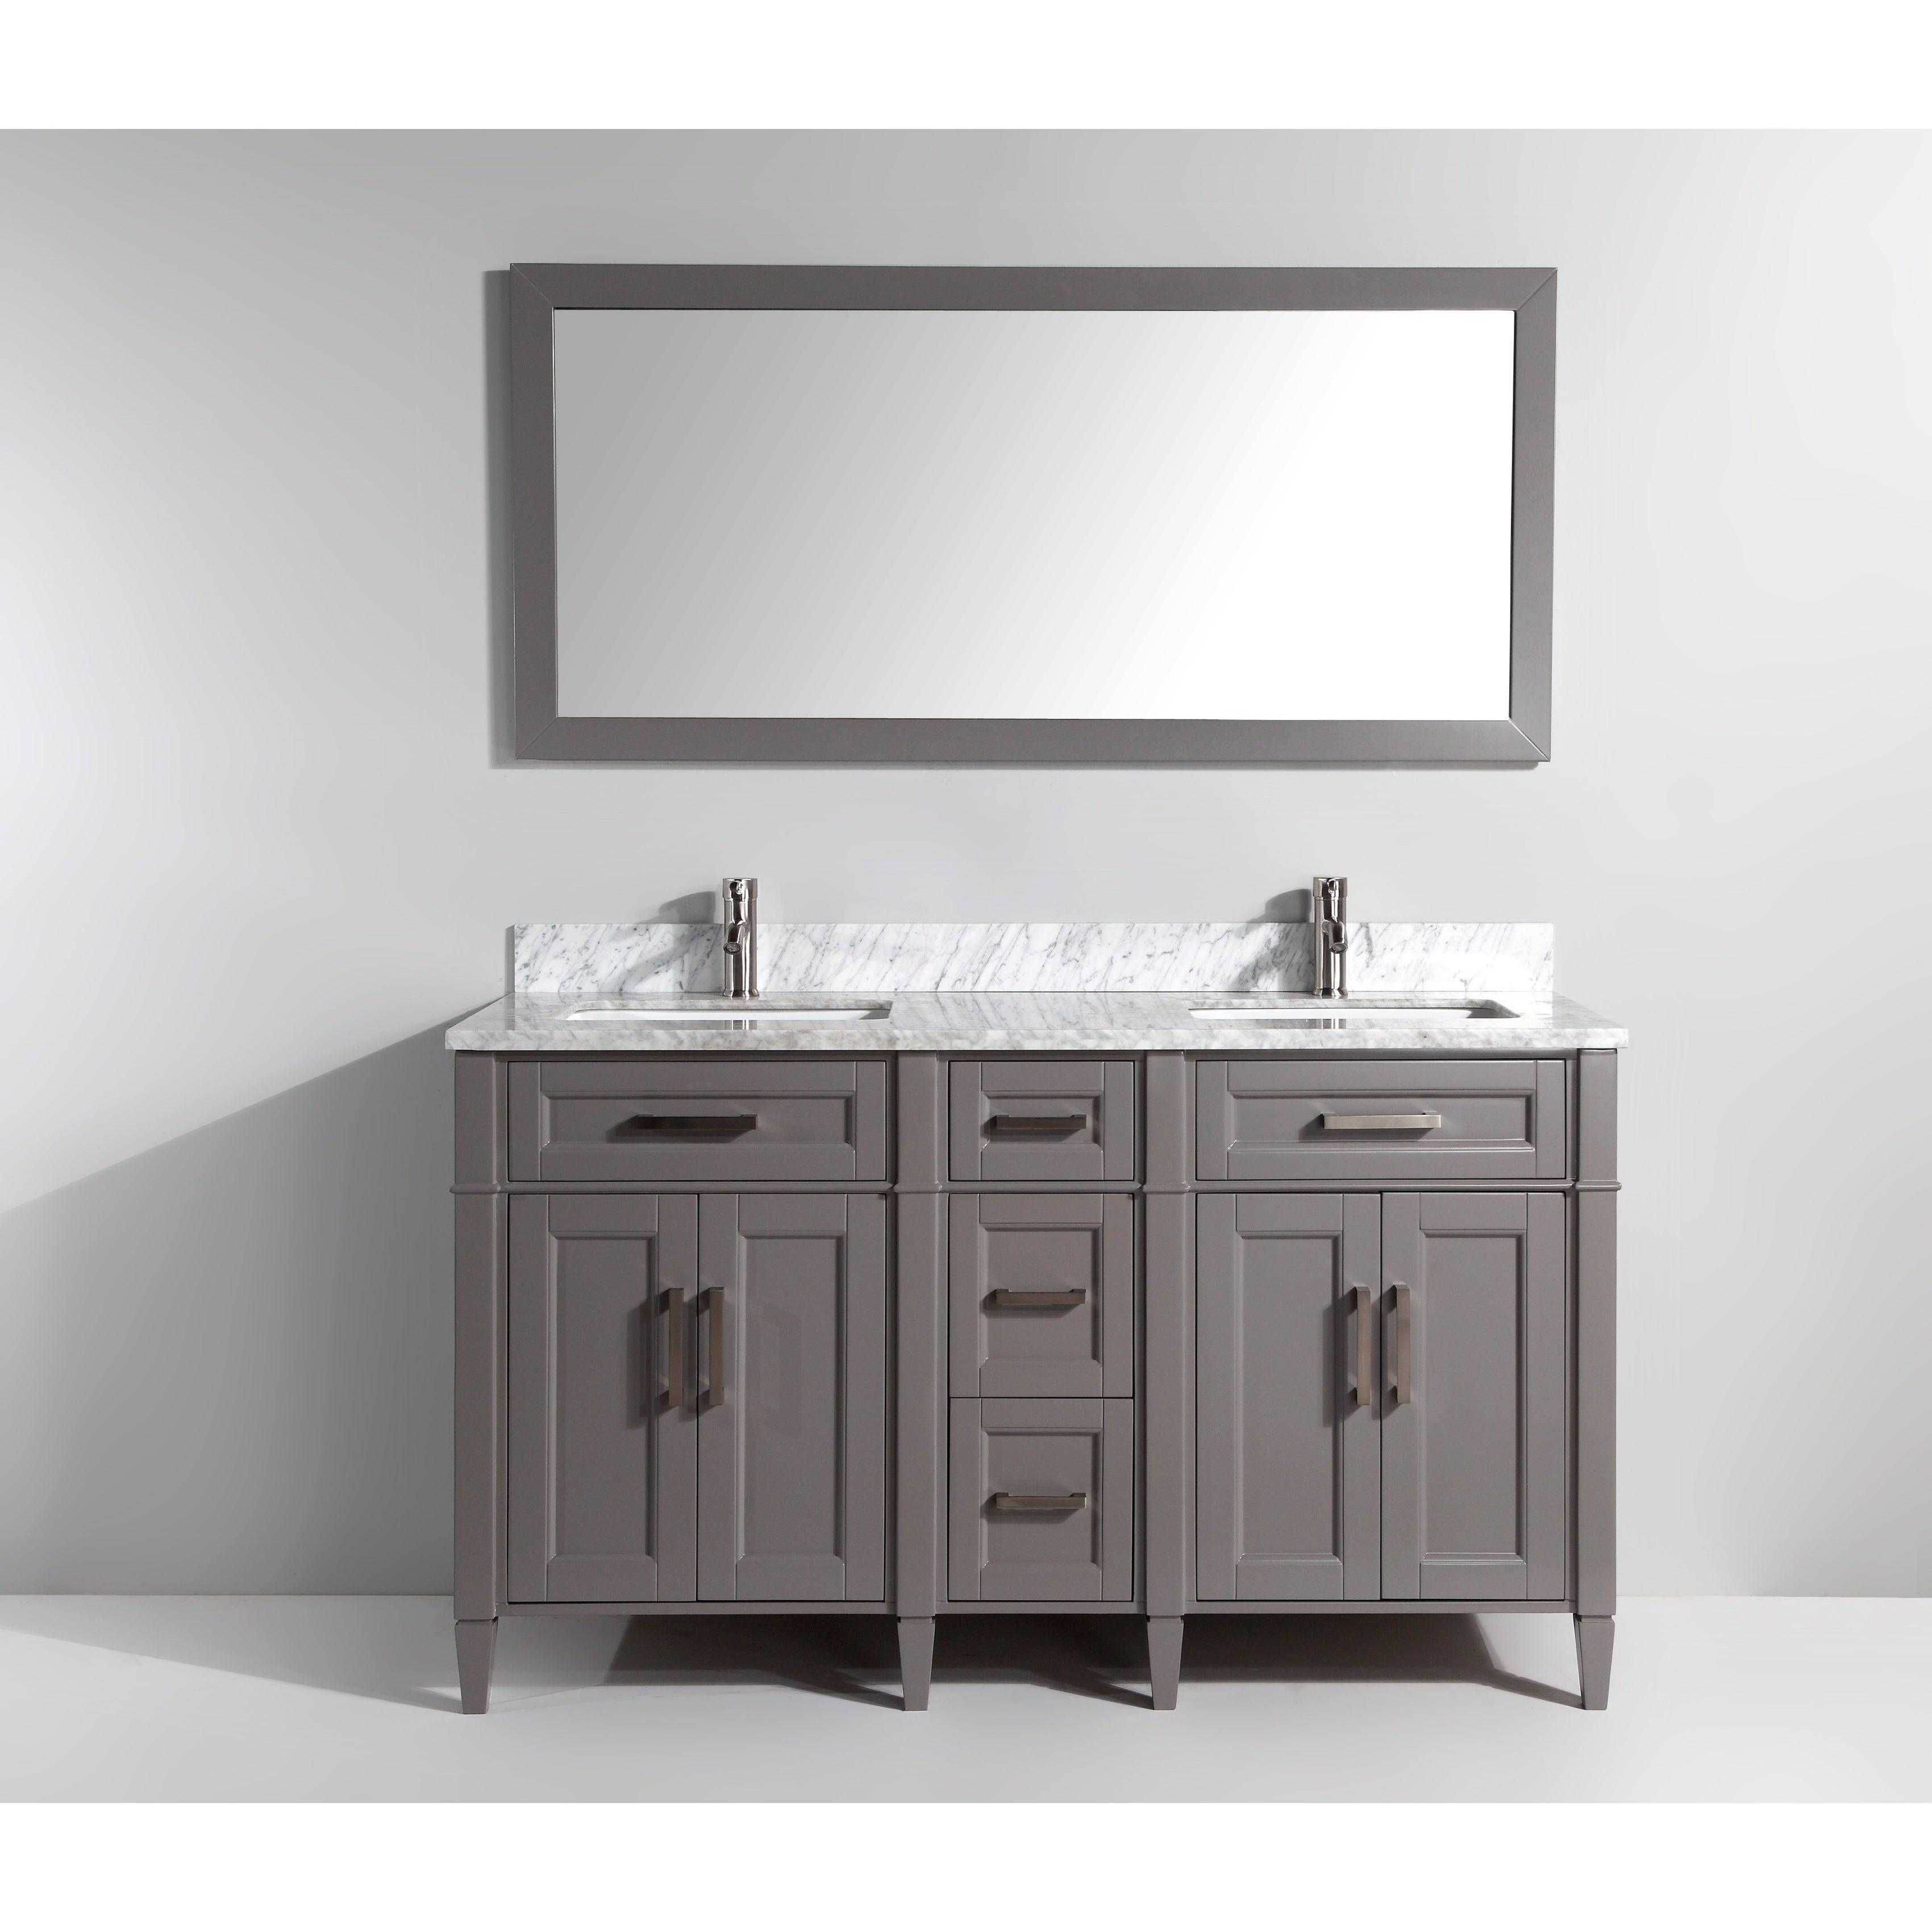 Details About Vanity Art 60 Inch Double Sink Bathroom Vanity Set With  Carrara Marble Top Rh Ebay Com 60 Inch White Double Bathroom Vanity 60 Inch  Double ...